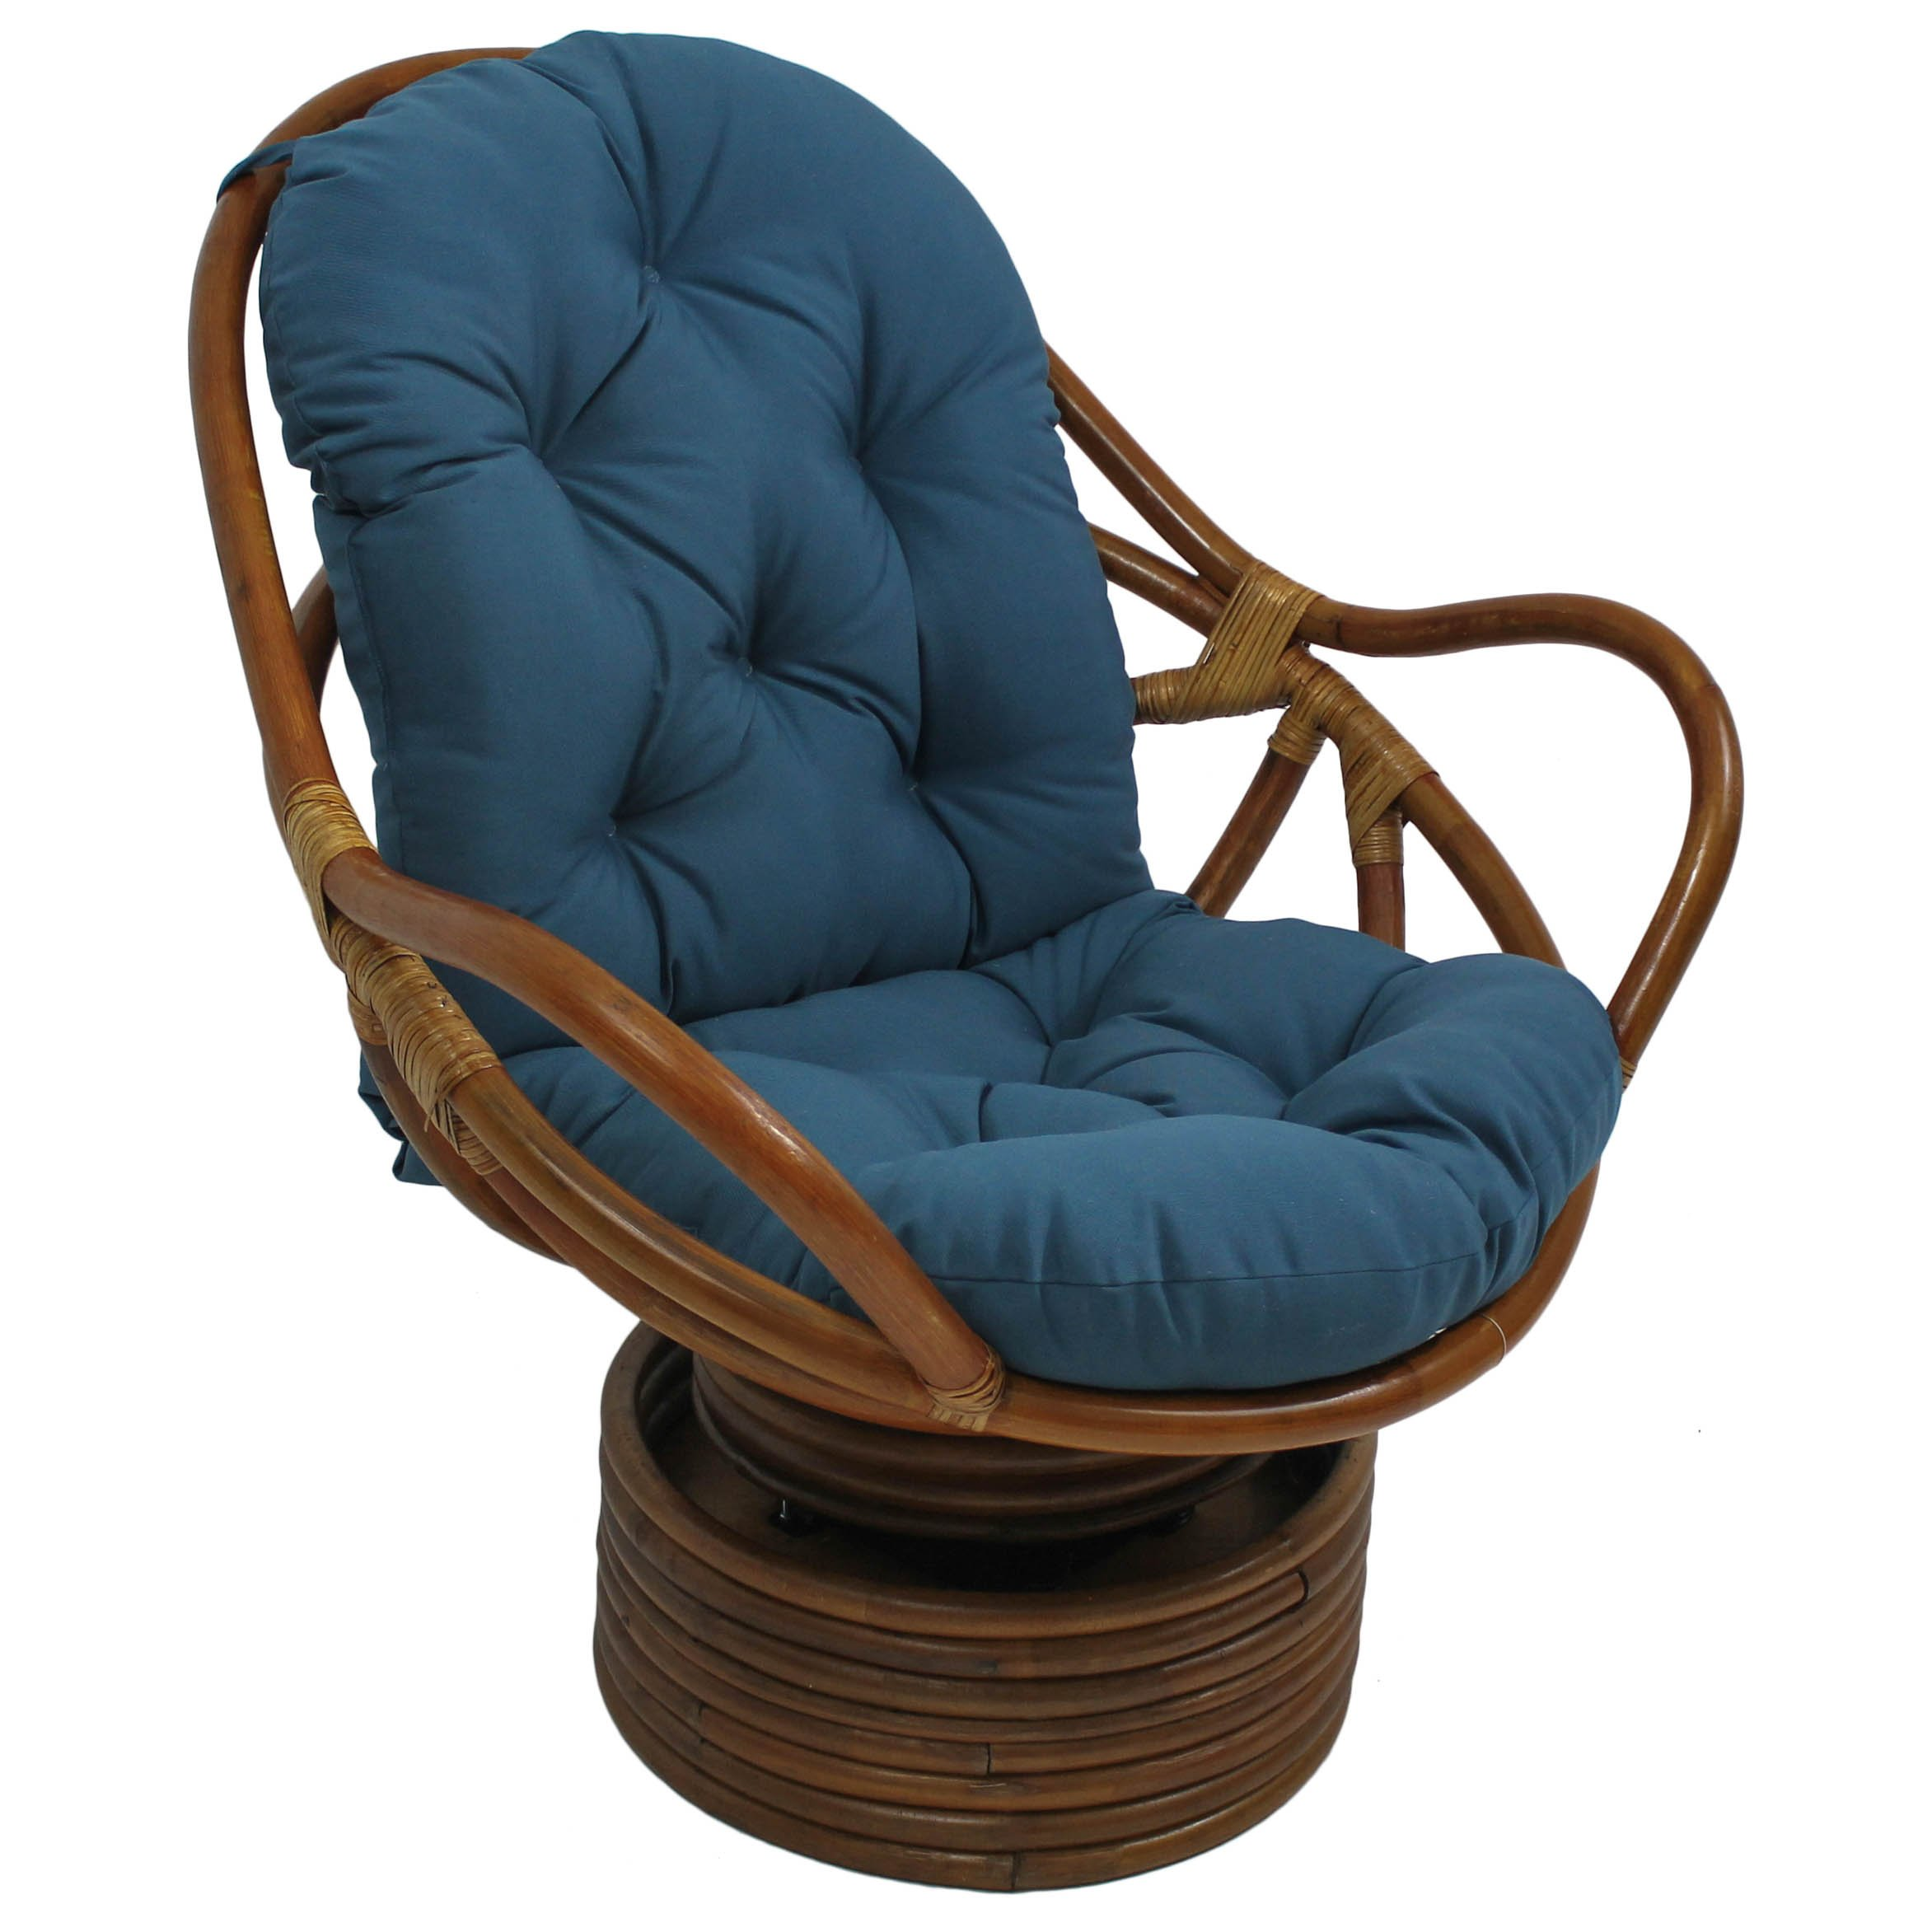 Blazing Needles Solid Twill Swivel Rocker Chair Cushion, 48'' x 24'', Indigo by Blazing Needles